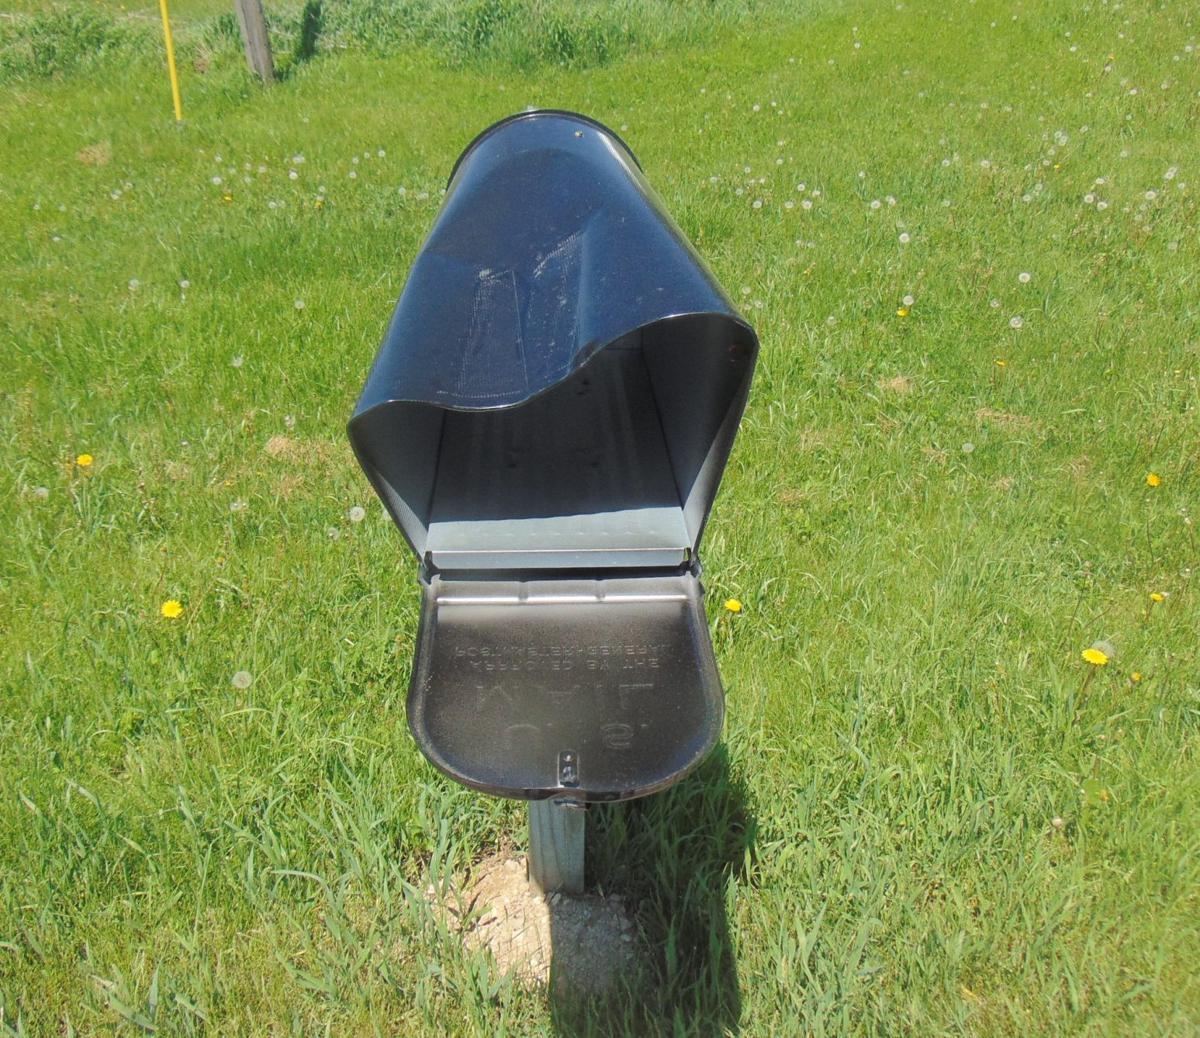 Mailbox damage